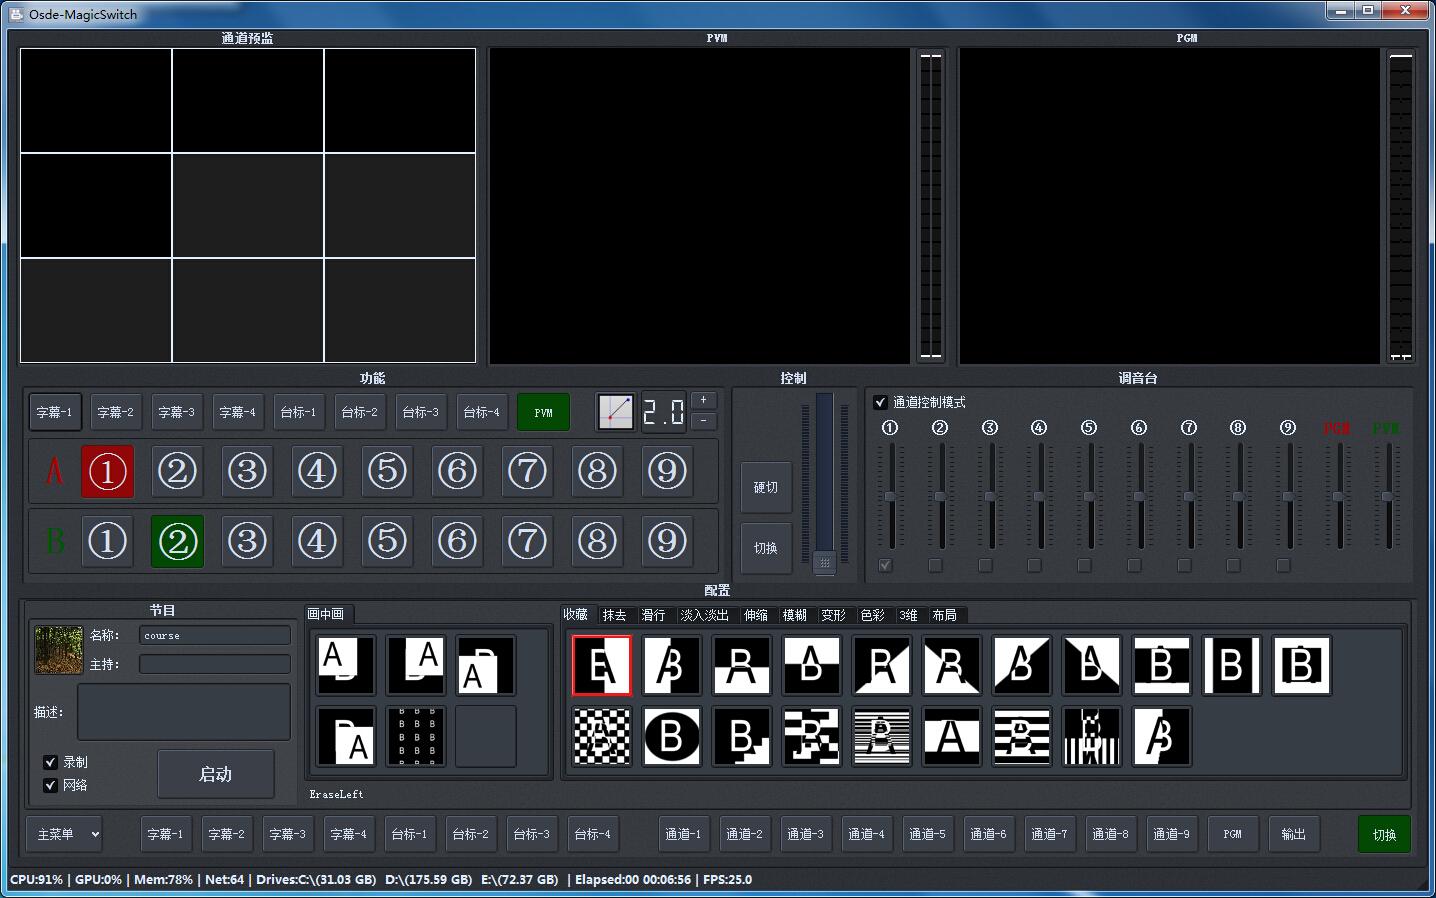 OSDE-MagicSwitch数字切换录播系统